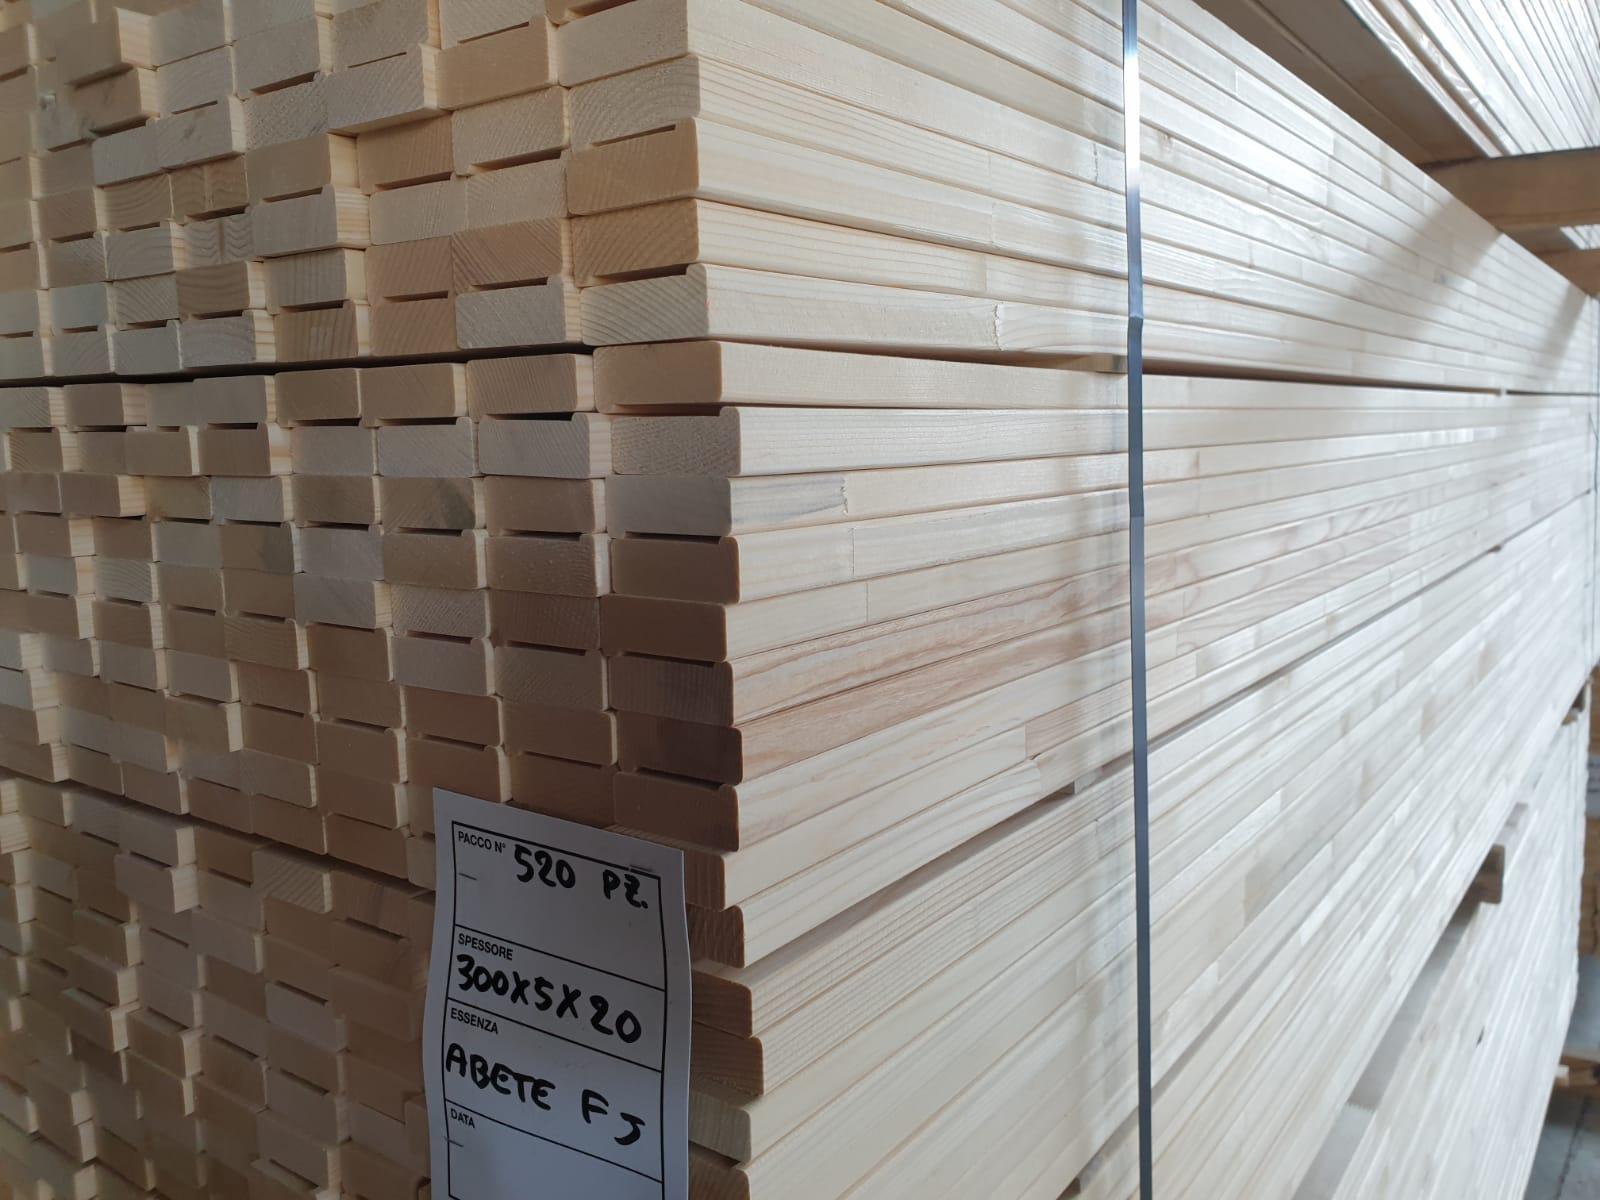 ABETE FINGER JOINT 1 - SP 20 E 30 - lungh mt 3, largh cm 5 e 7, ideale per produzione strutture tenditela per quadri e dipinti (3)